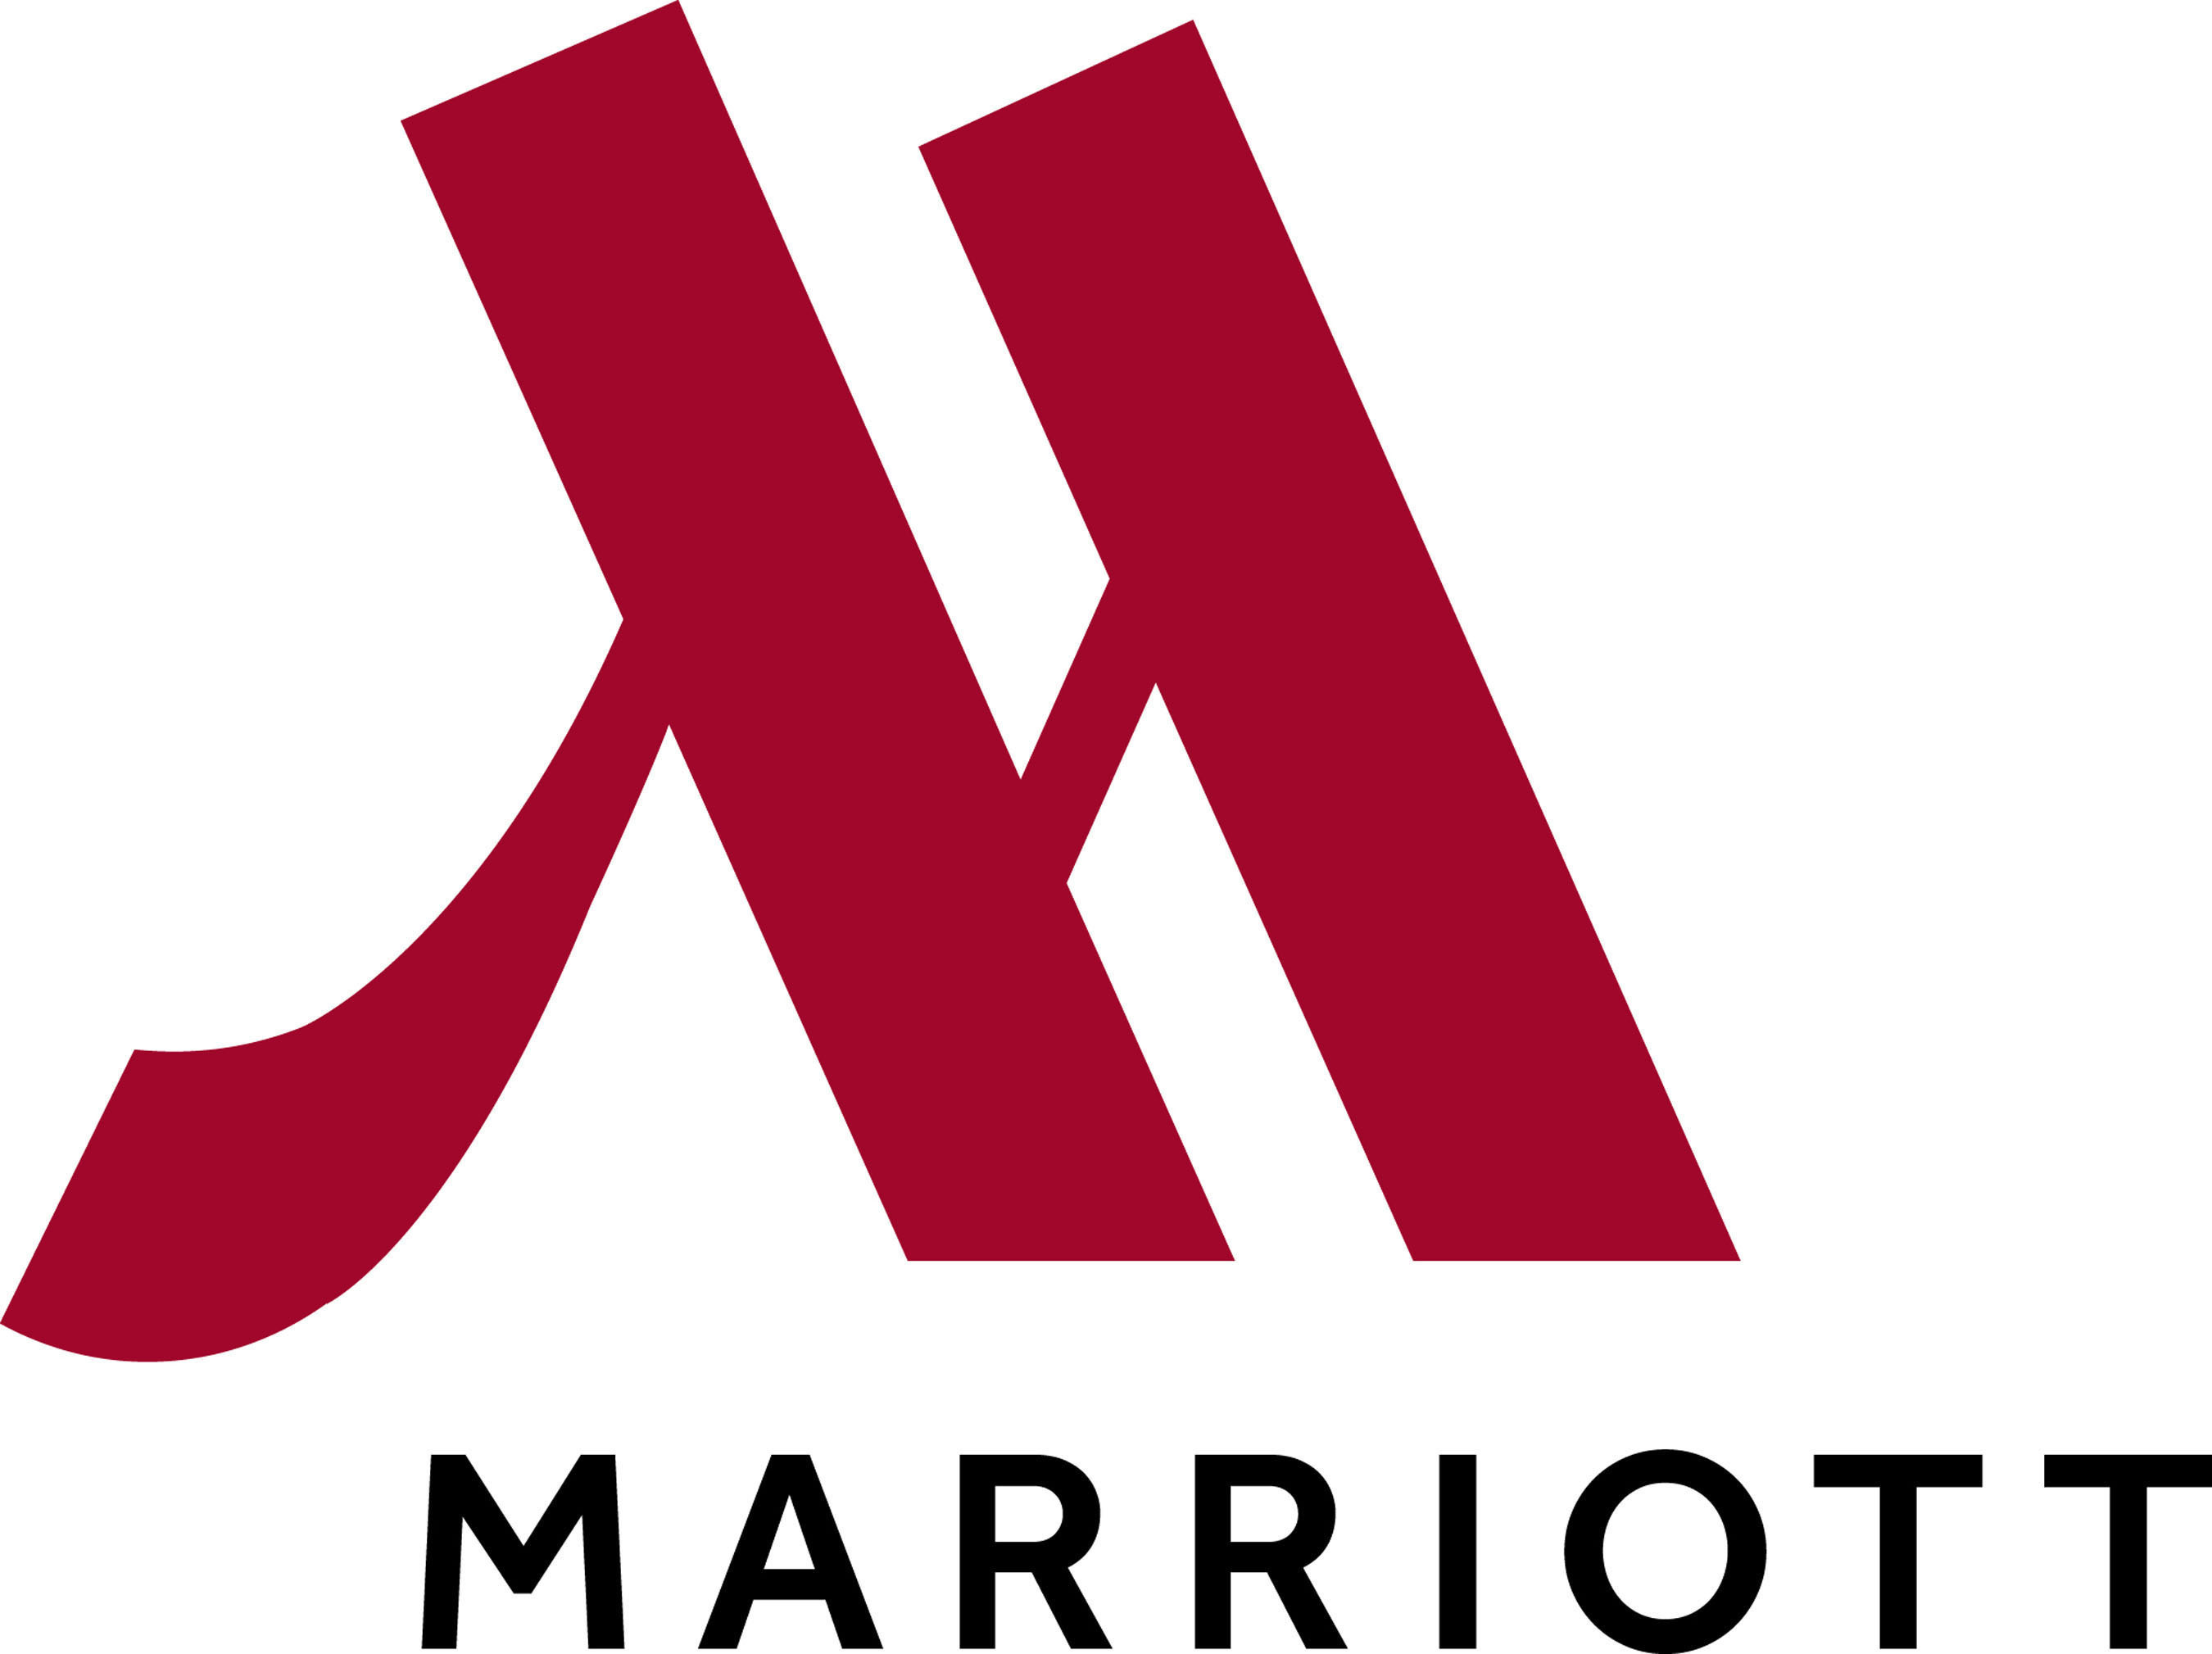 Marriott Hotels & Resorts logo.  (PRNewsFoto/Marriott Hotels & Resorts)